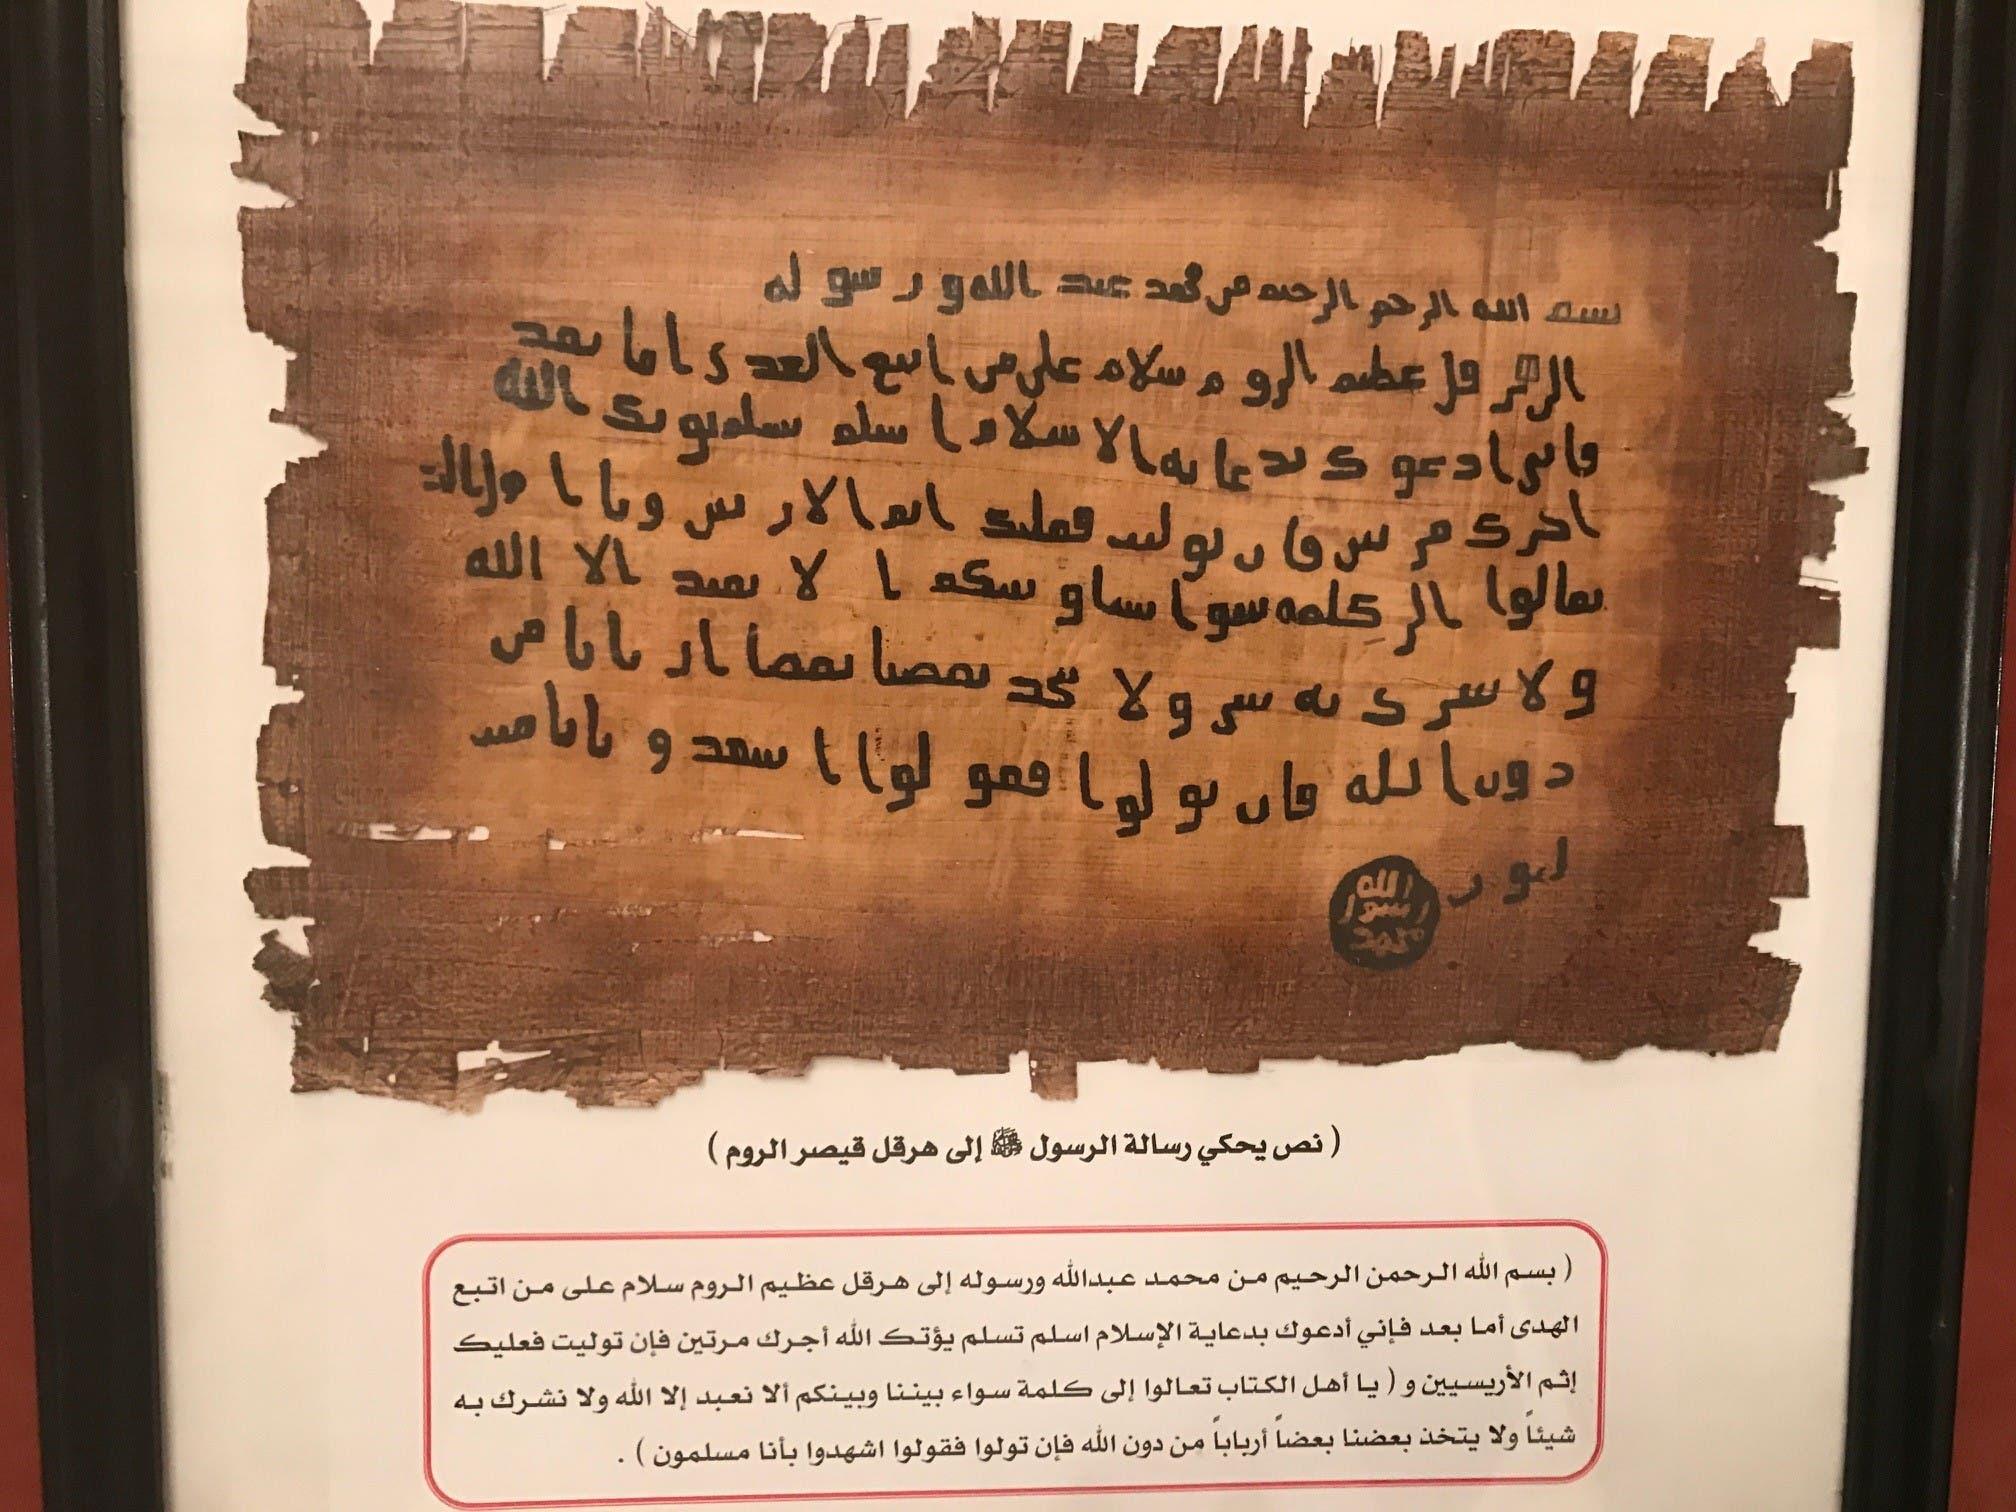 بالصور.. رسائل النبي محمد ملوك 16d063e0-c014-40c7-8